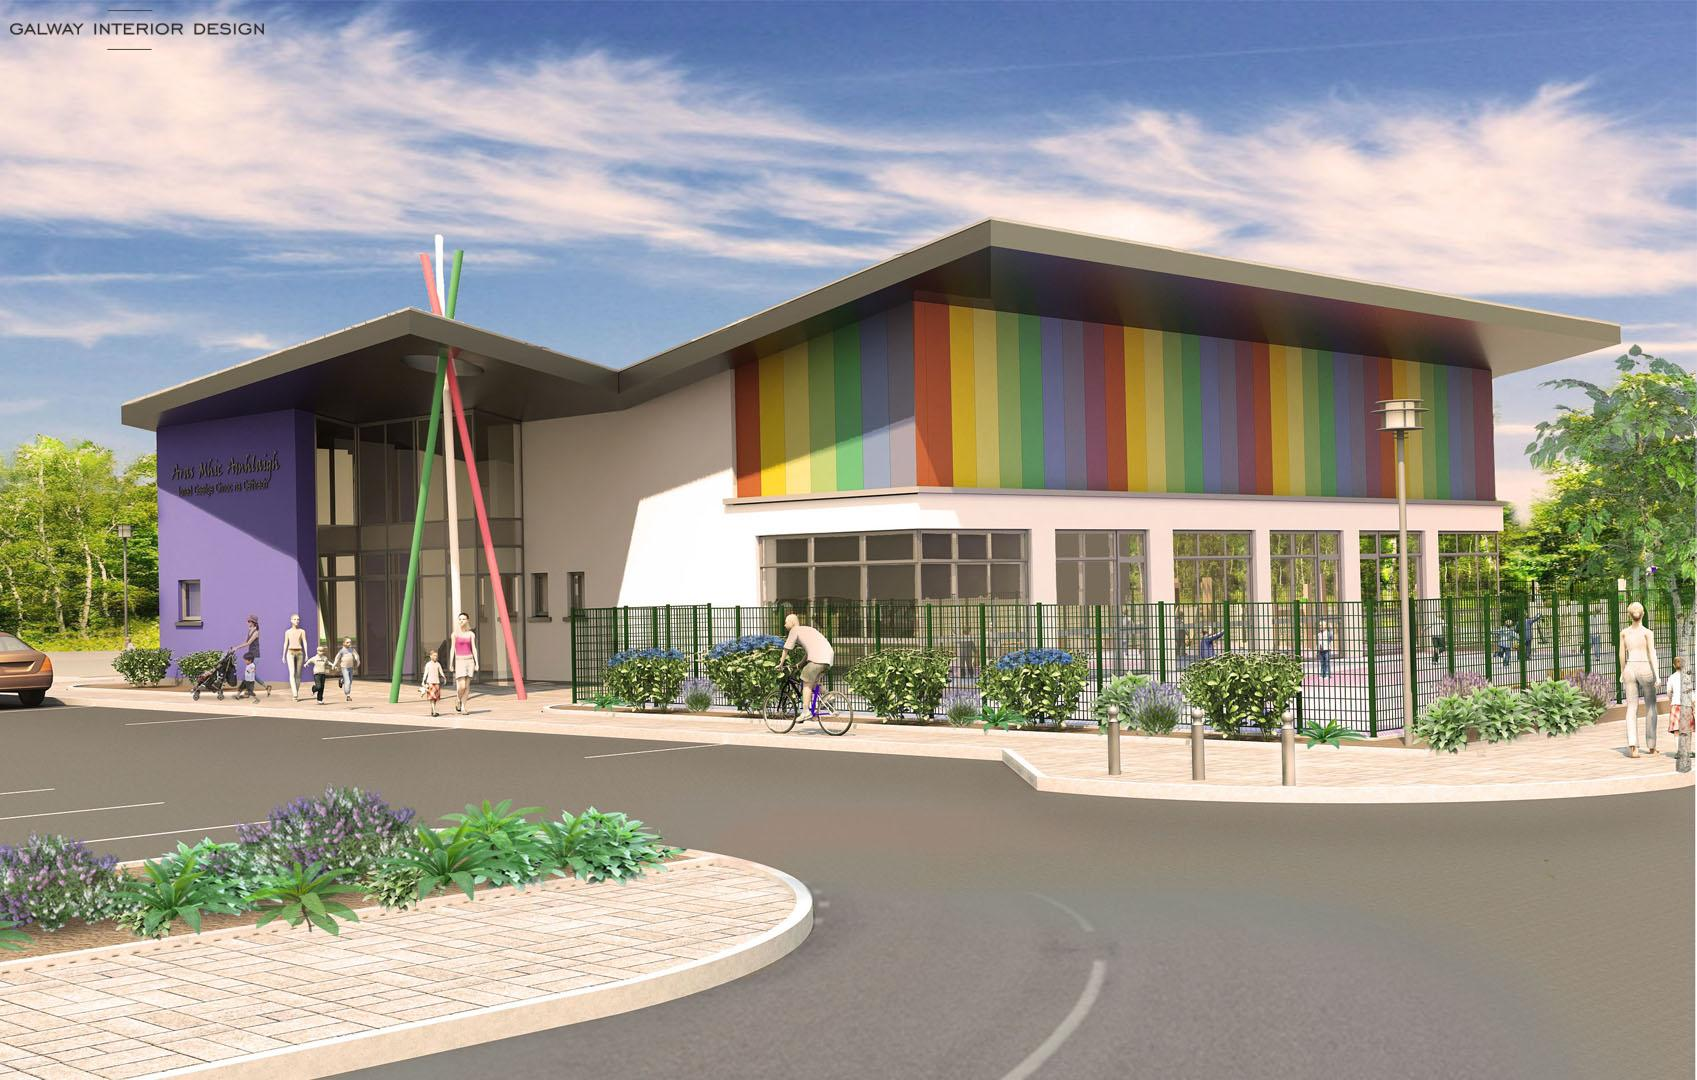 Galway Interior Design Visualisation Preschool Gaelscoil Mhic Amhlaigh West View